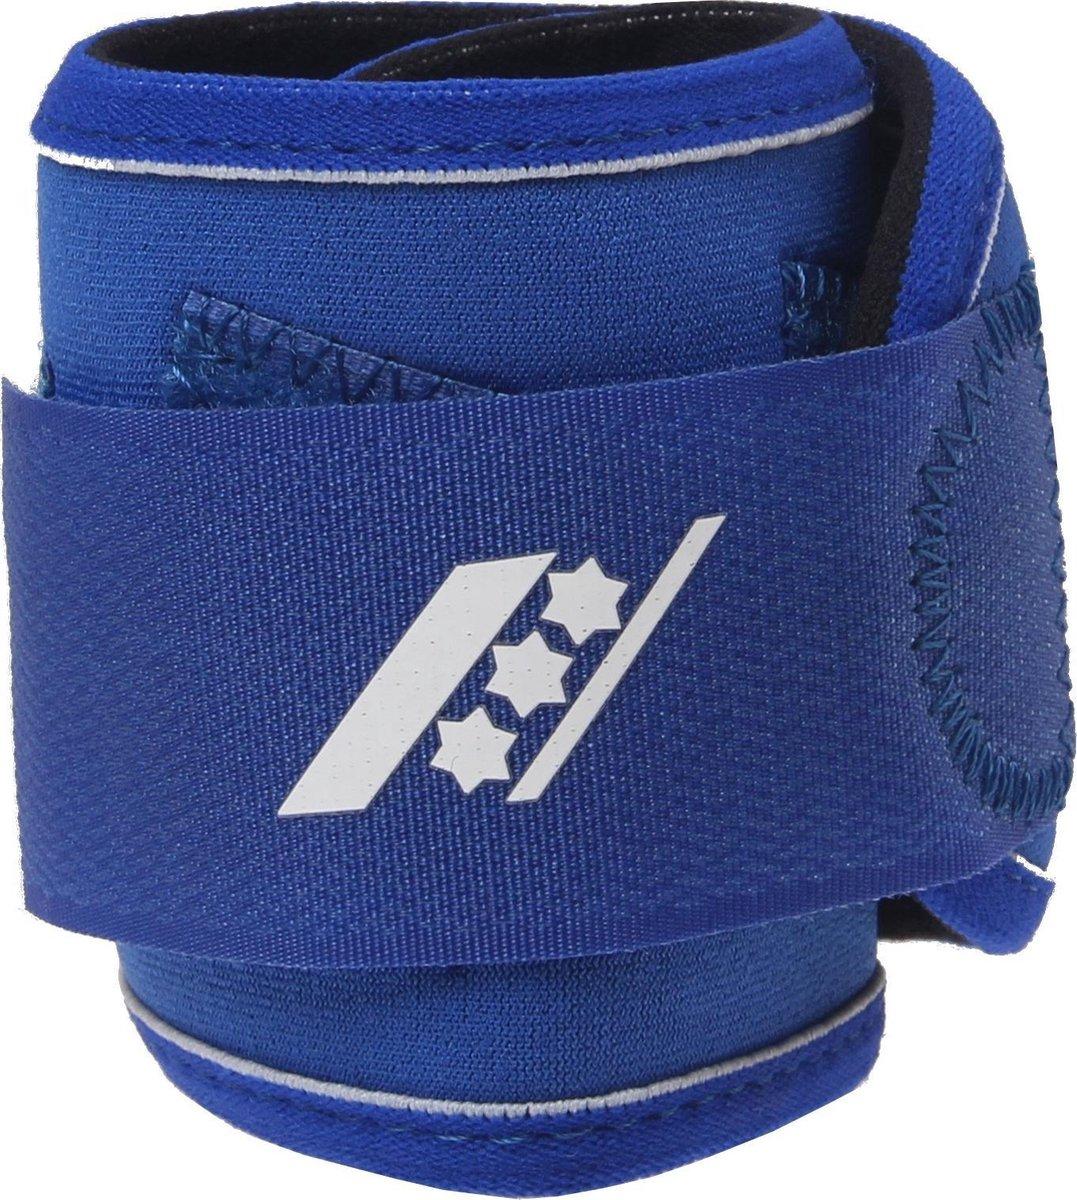 Rucanor Carpo Polsbandage - Sportbandages - blauw kobalt - ONE